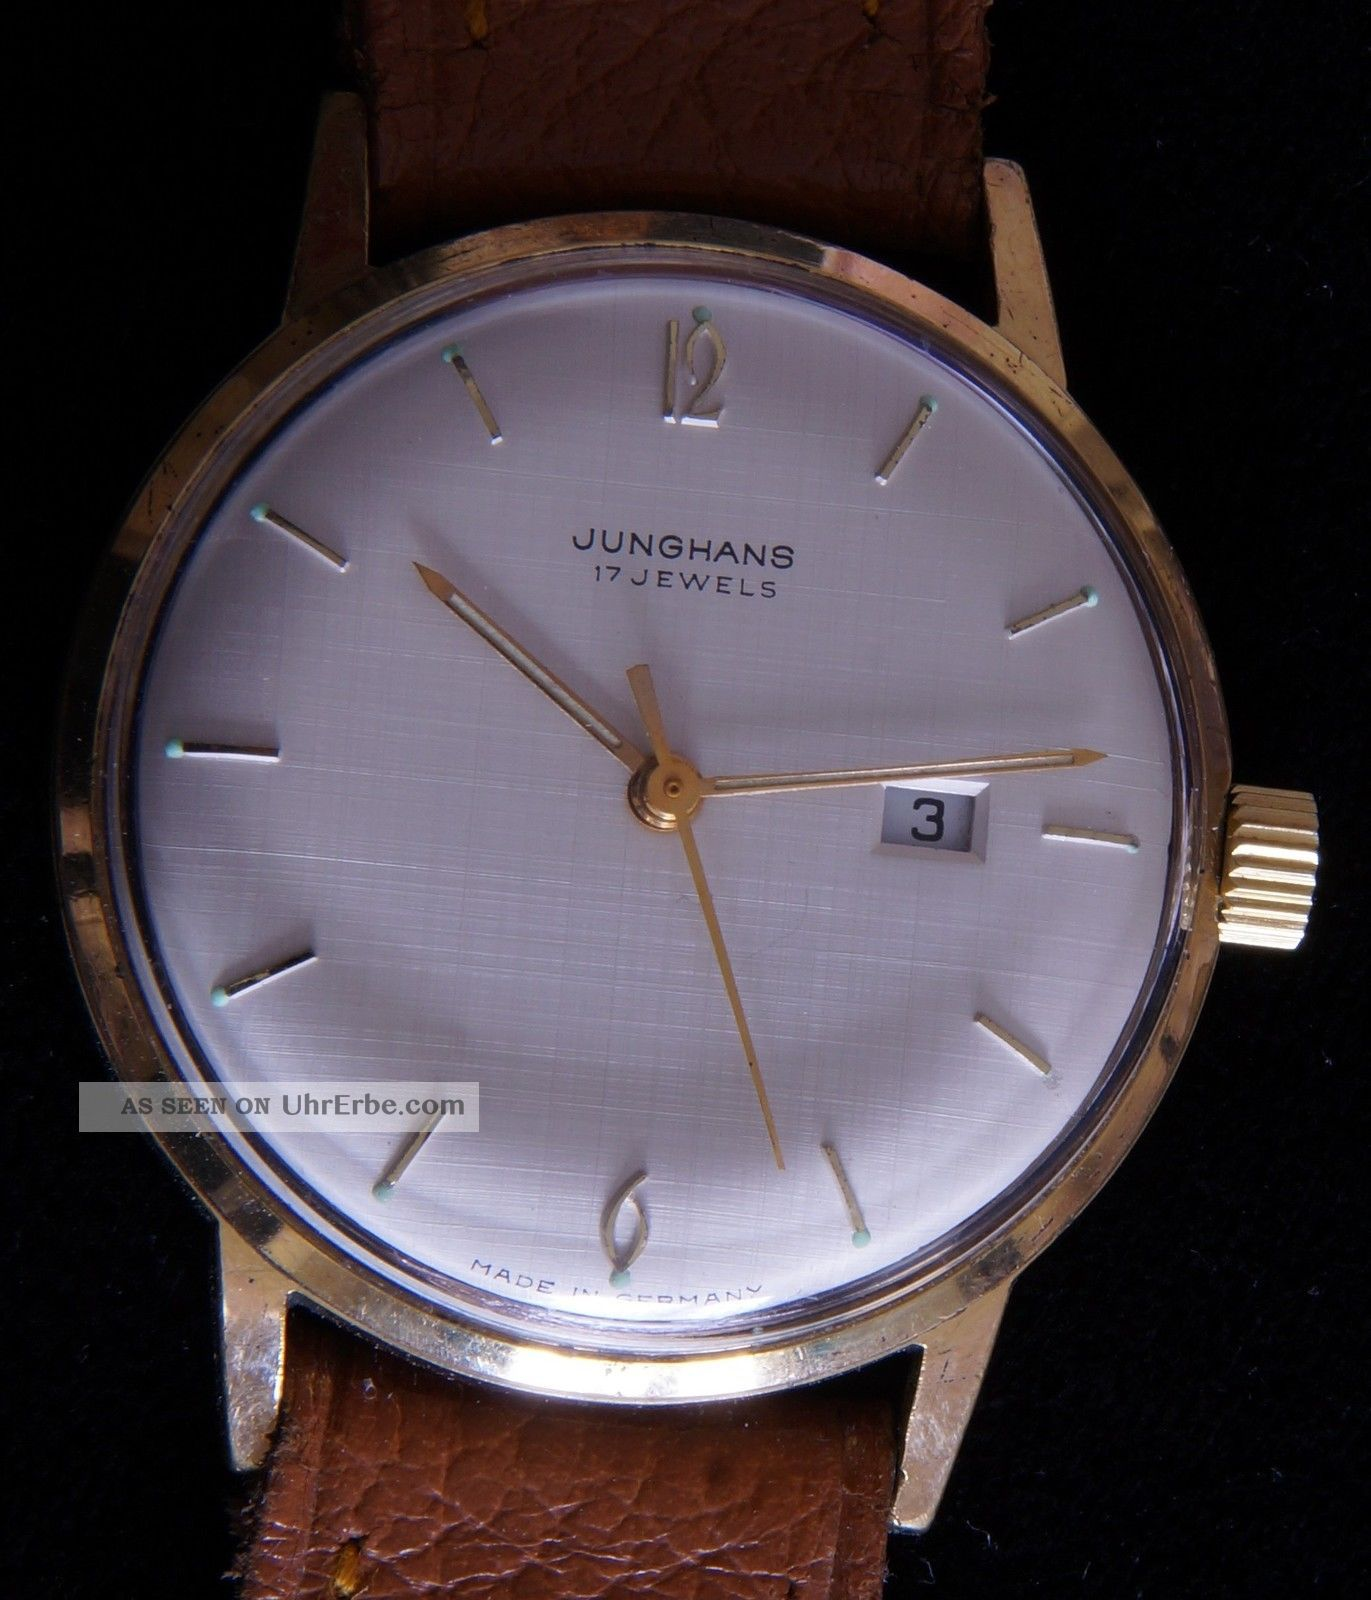 Junghans 17 Jewels Herren - Armbanduhr - 1960er Jahre,  34mm,  Datum Armbanduhren Bild